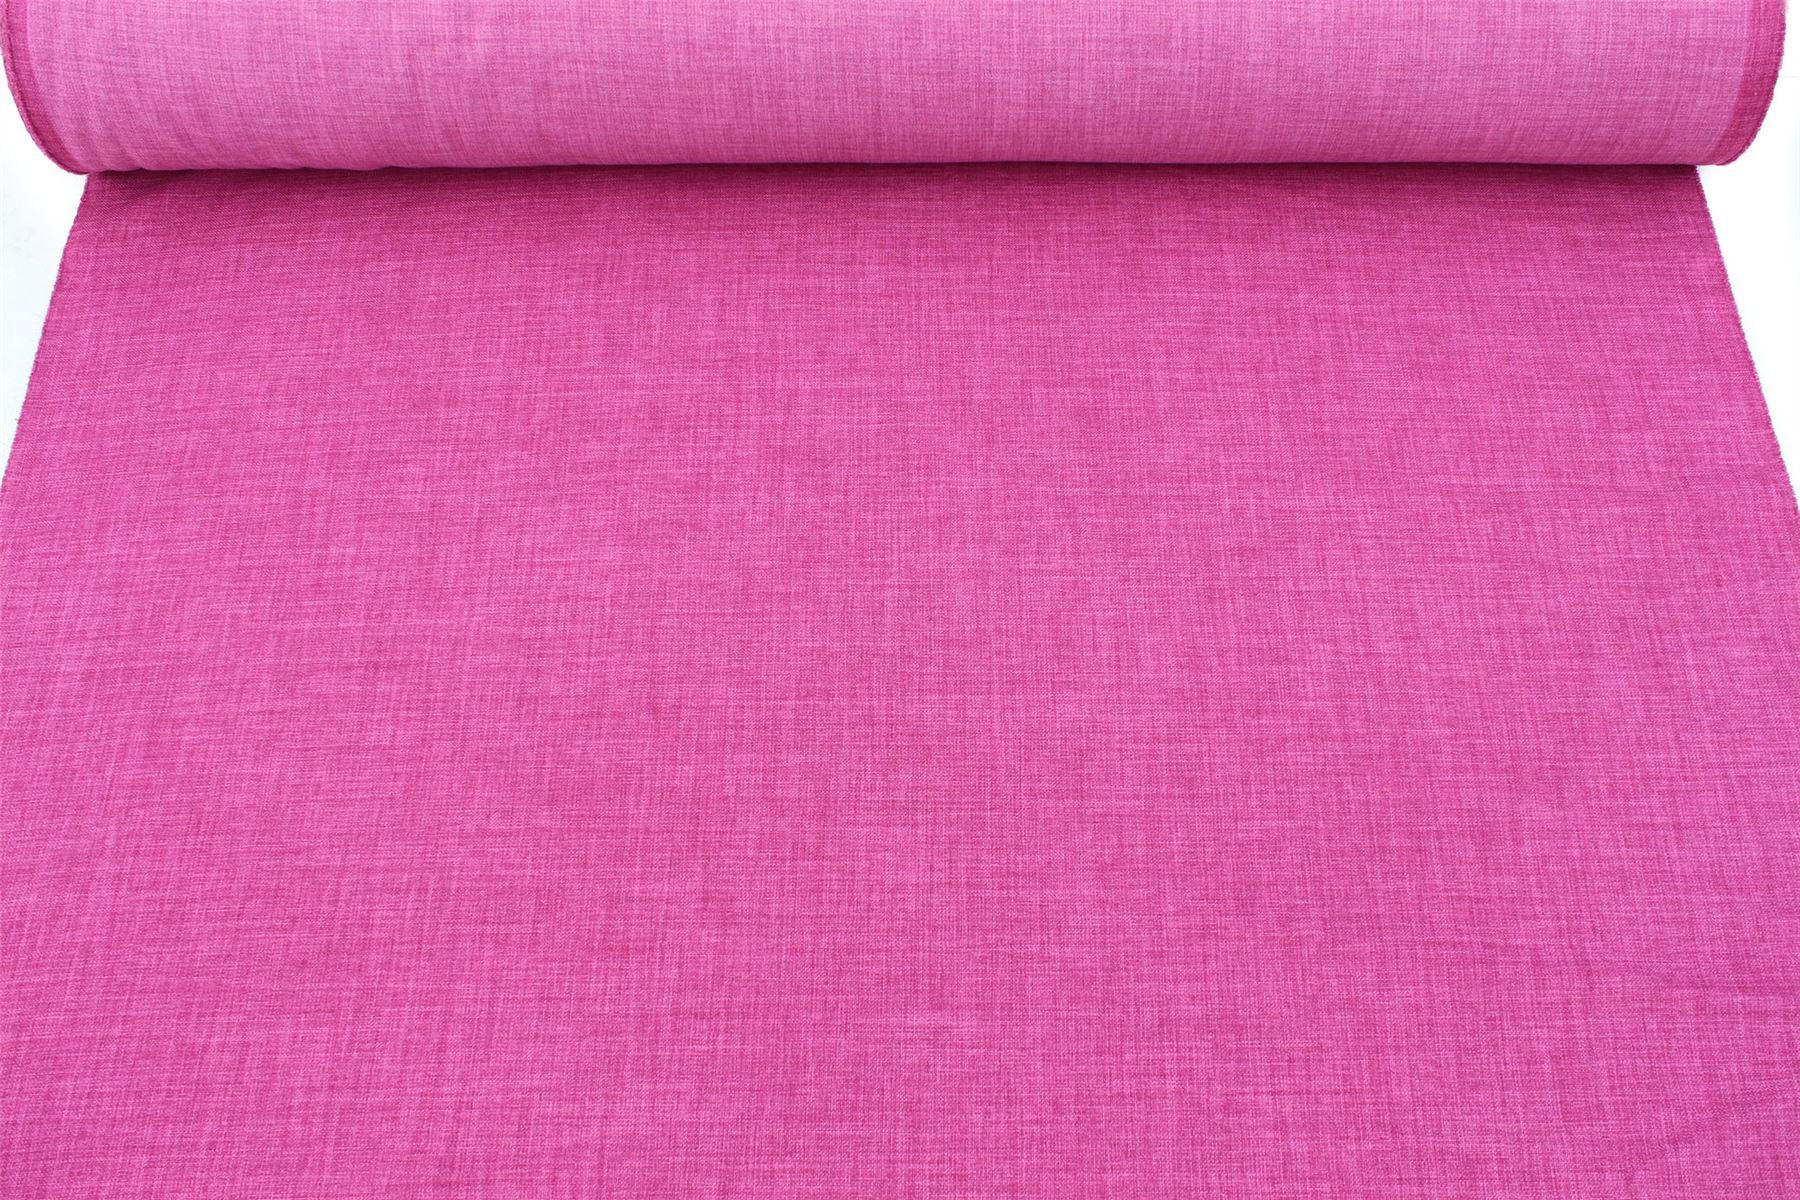 soft sofa material ikea manstad bed dimensions plain linen look designer curtain cushion